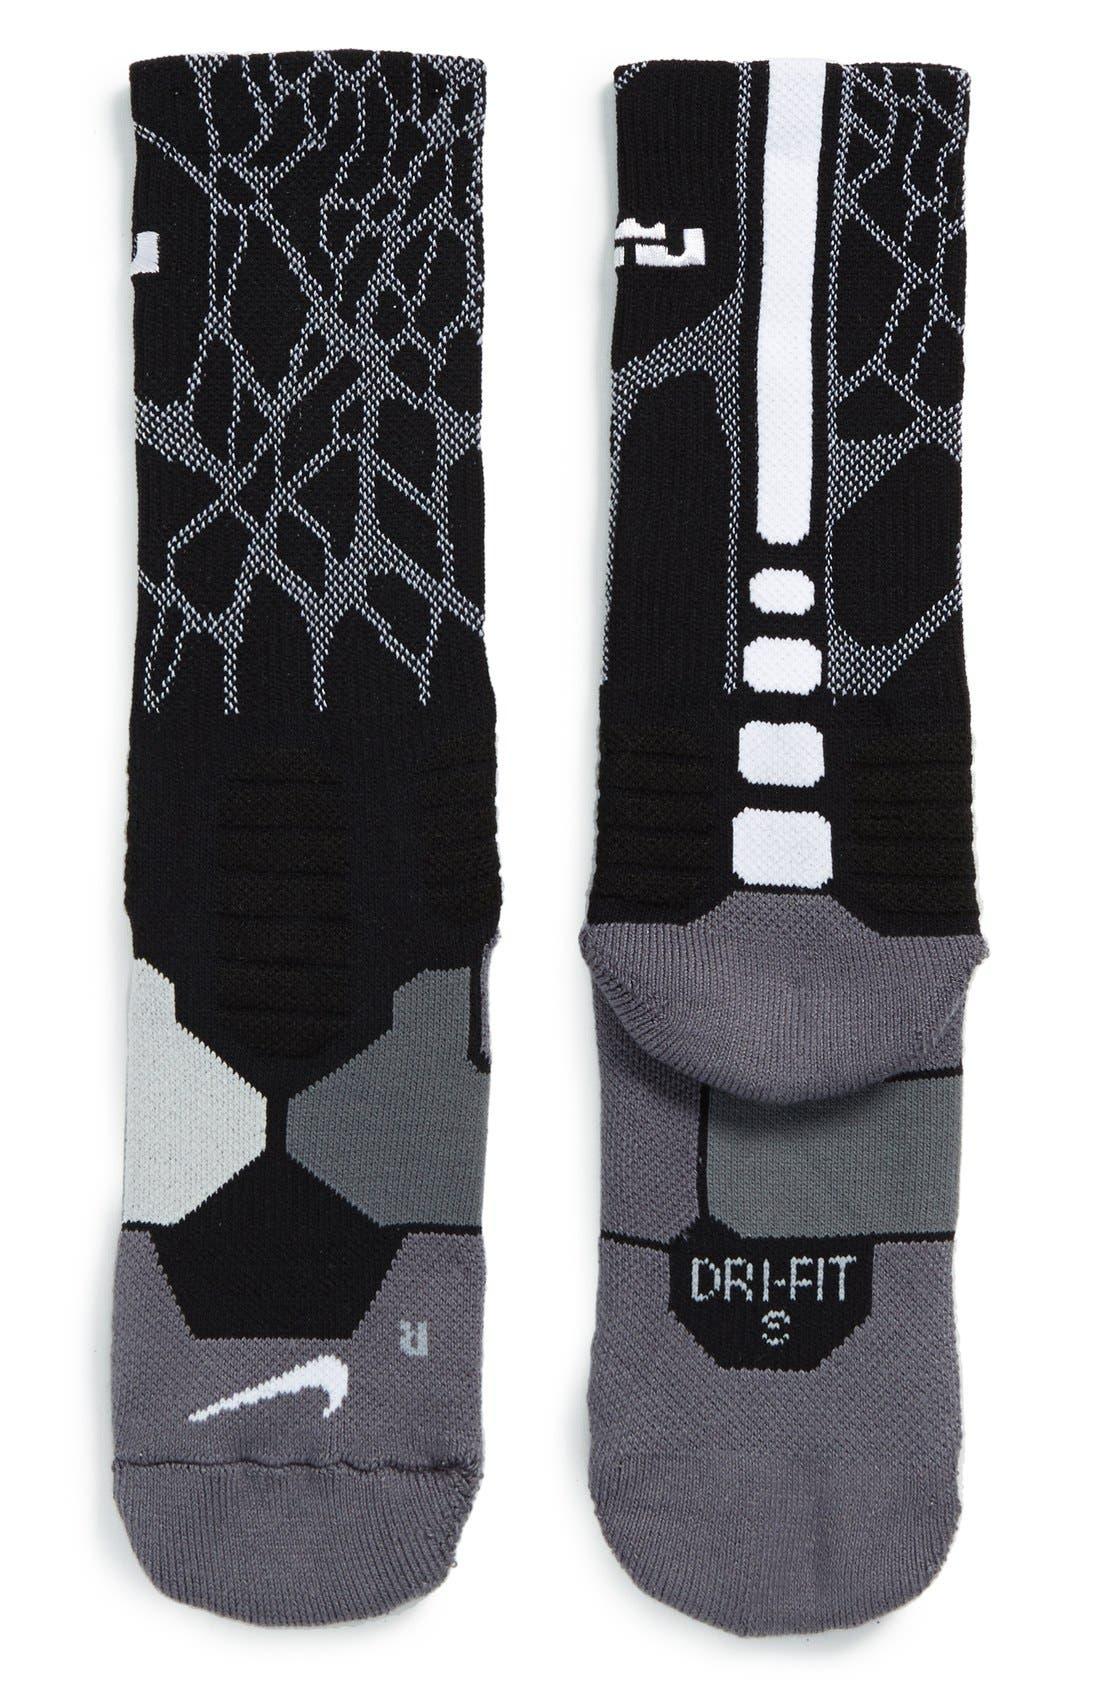 'LeBron - Hyper Elite' Cushioned Basketball Crew Socks,                             Alternate thumbnail 4, color,                             001